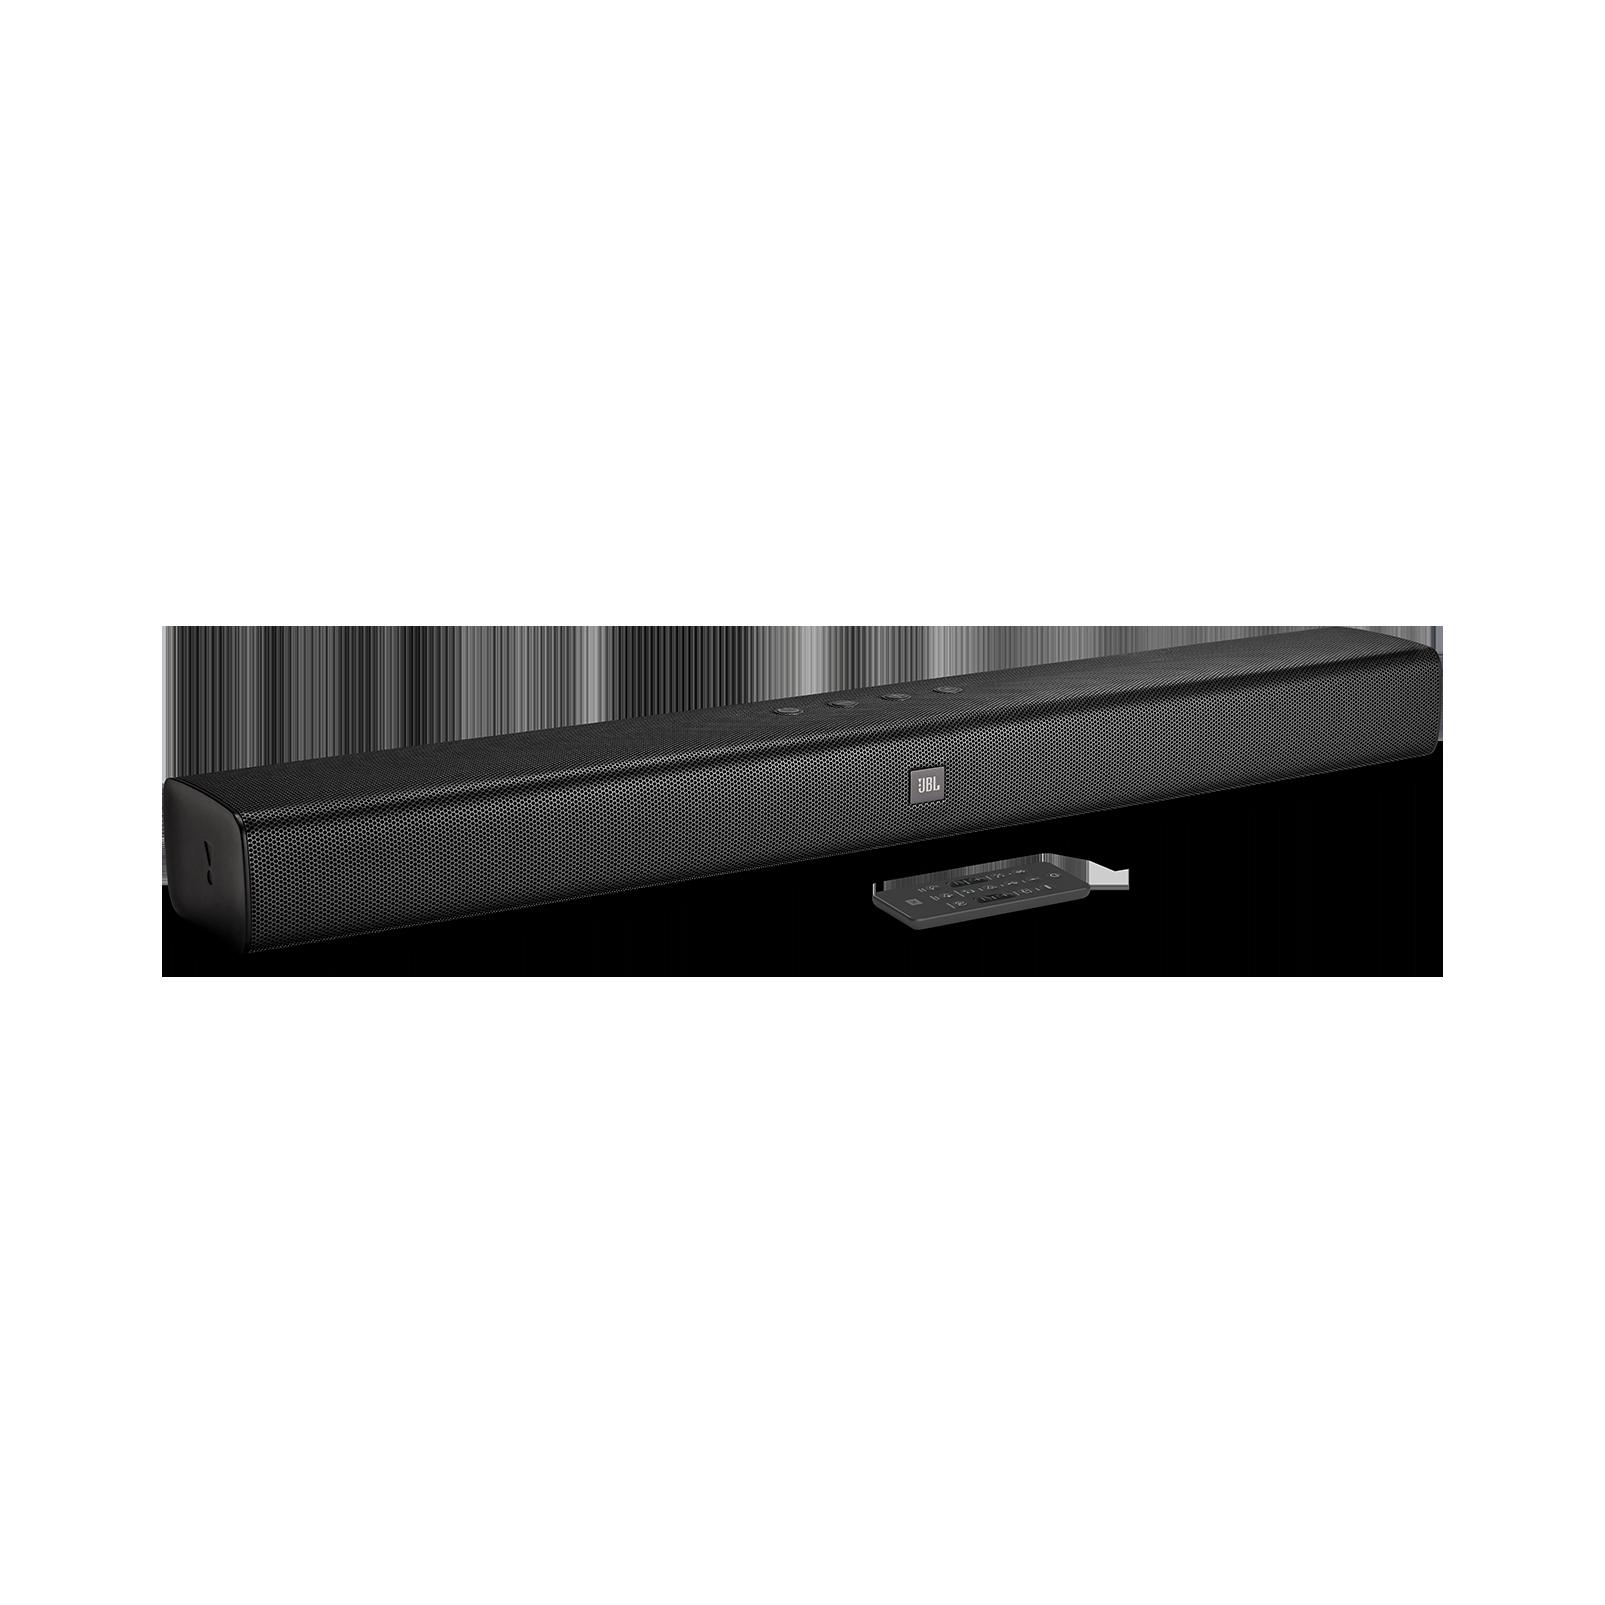 Jbl Bar Studio 20 Channel Soundbar With Bluetooth Speaker Diagram And Parts List For Nakamichi Audioequipmentparts